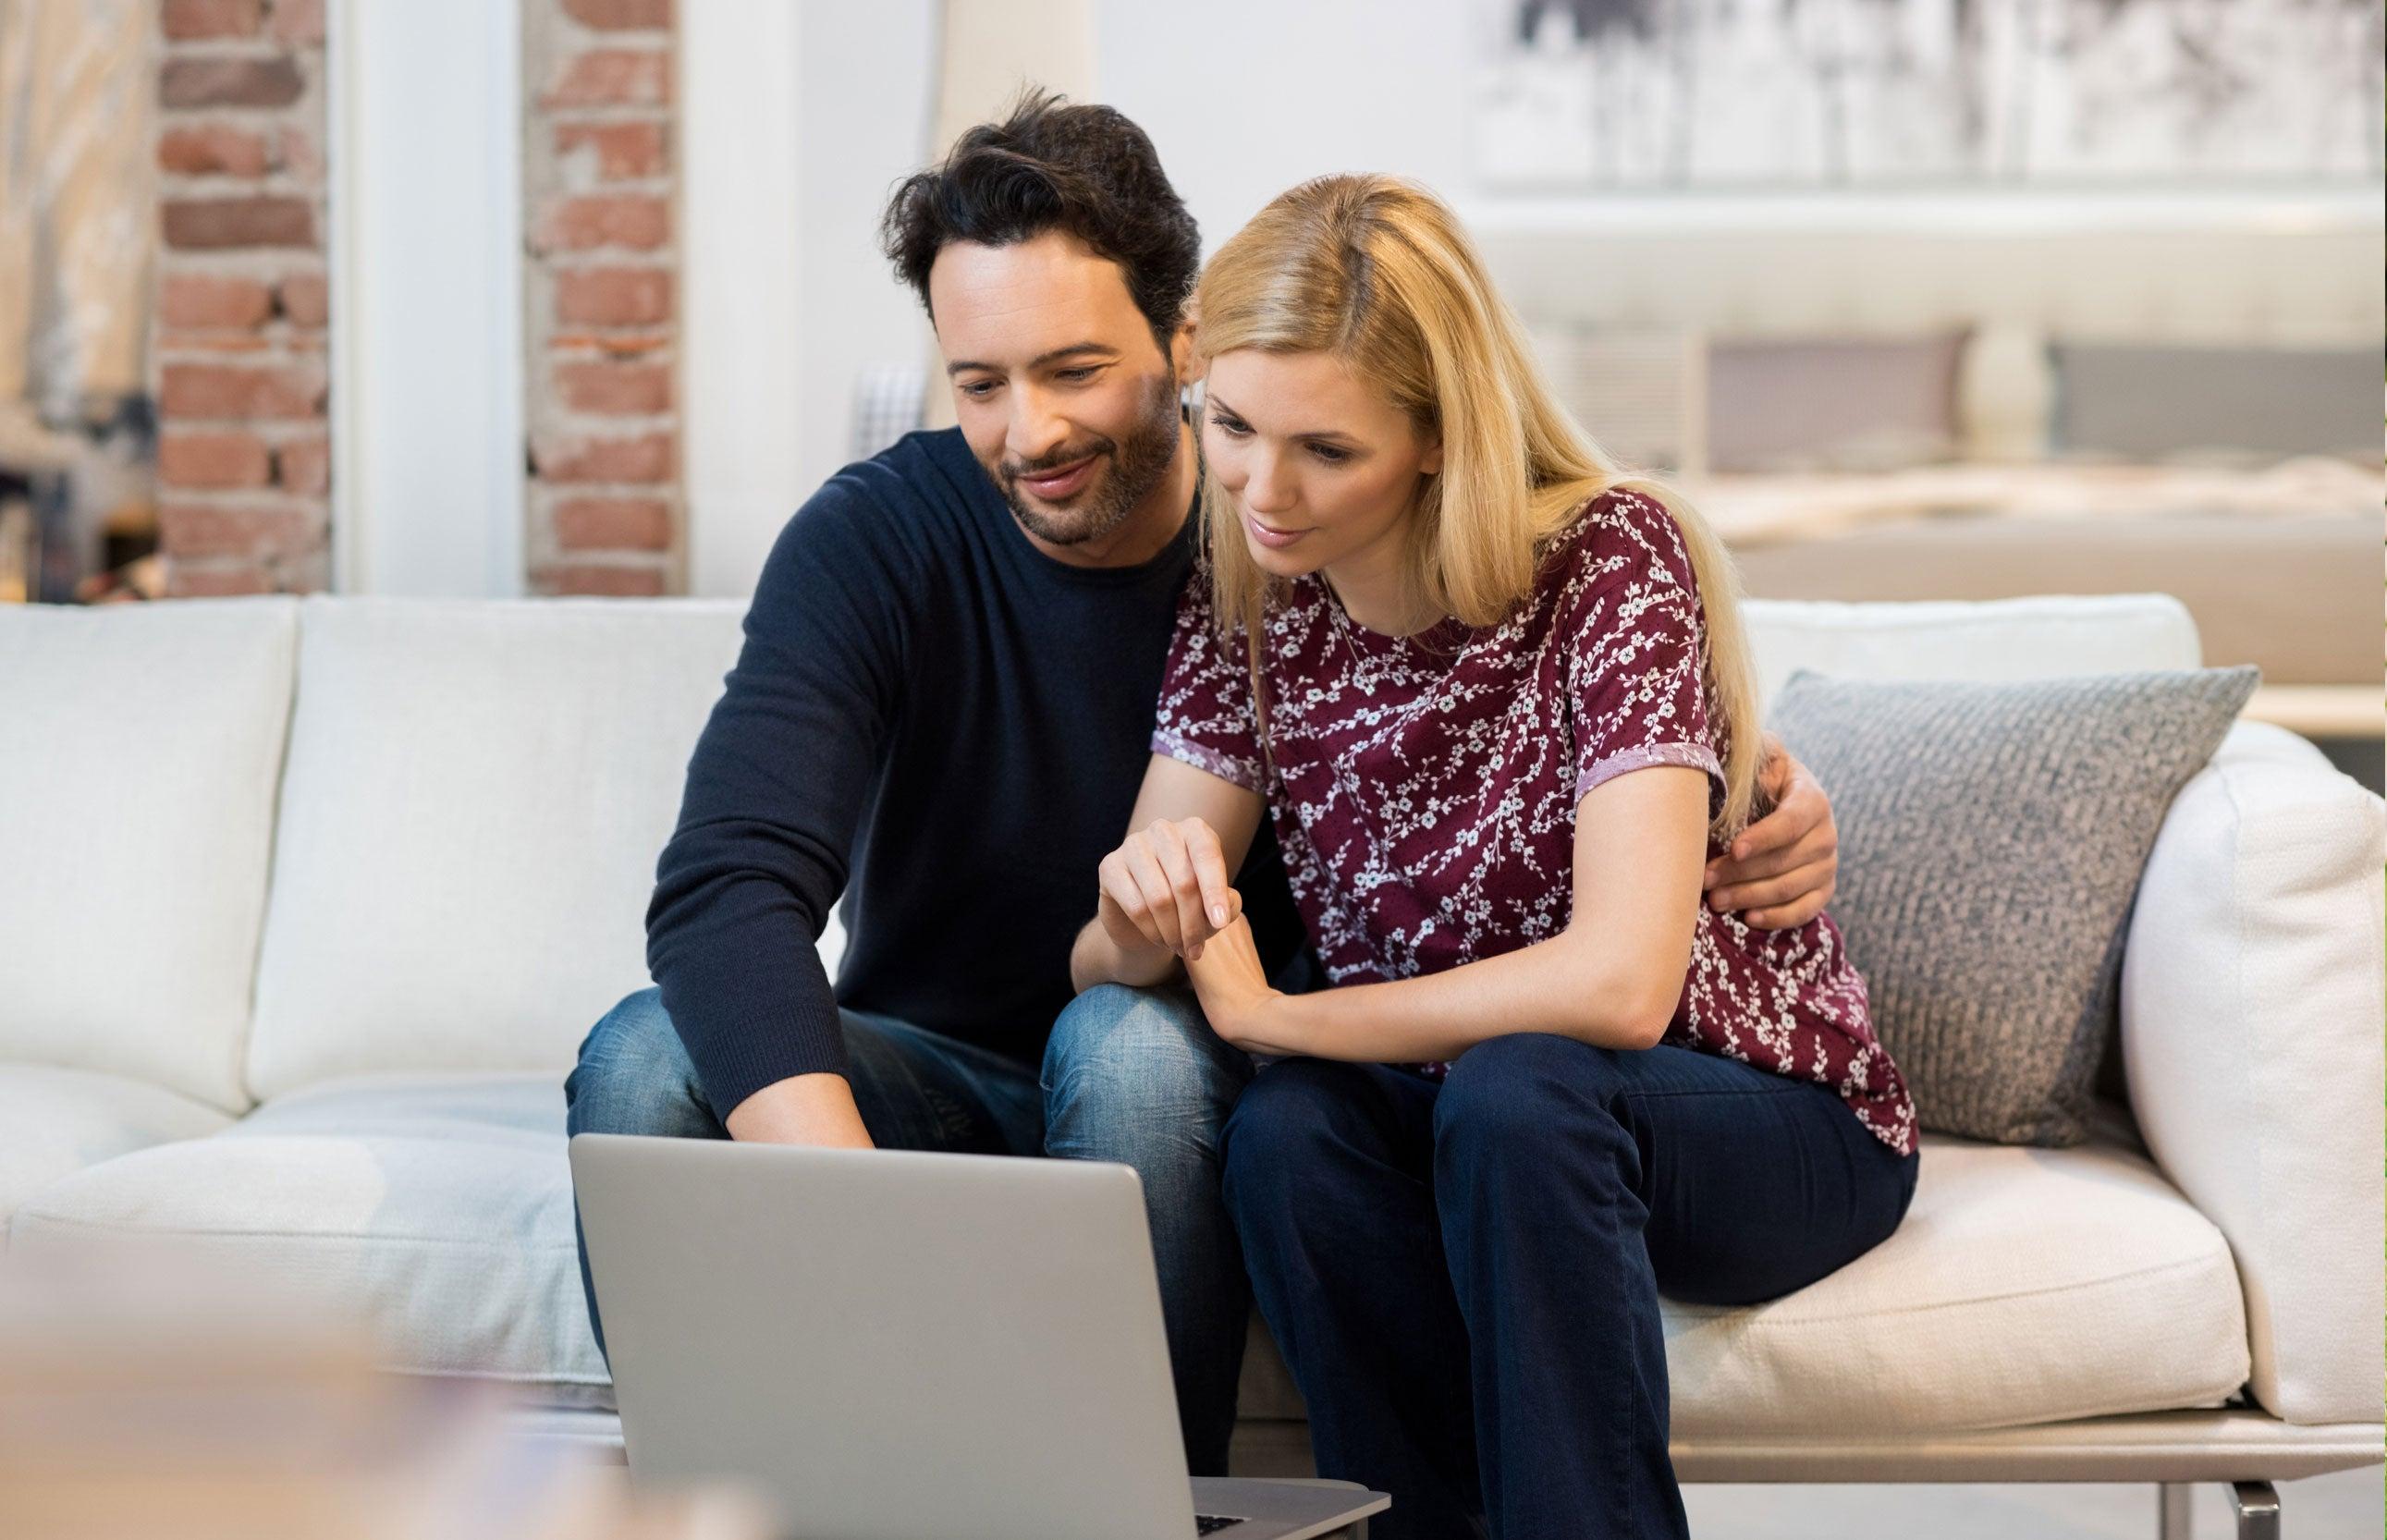 5 Random Reasons Your Credit Score Could Go Up | Credit.com